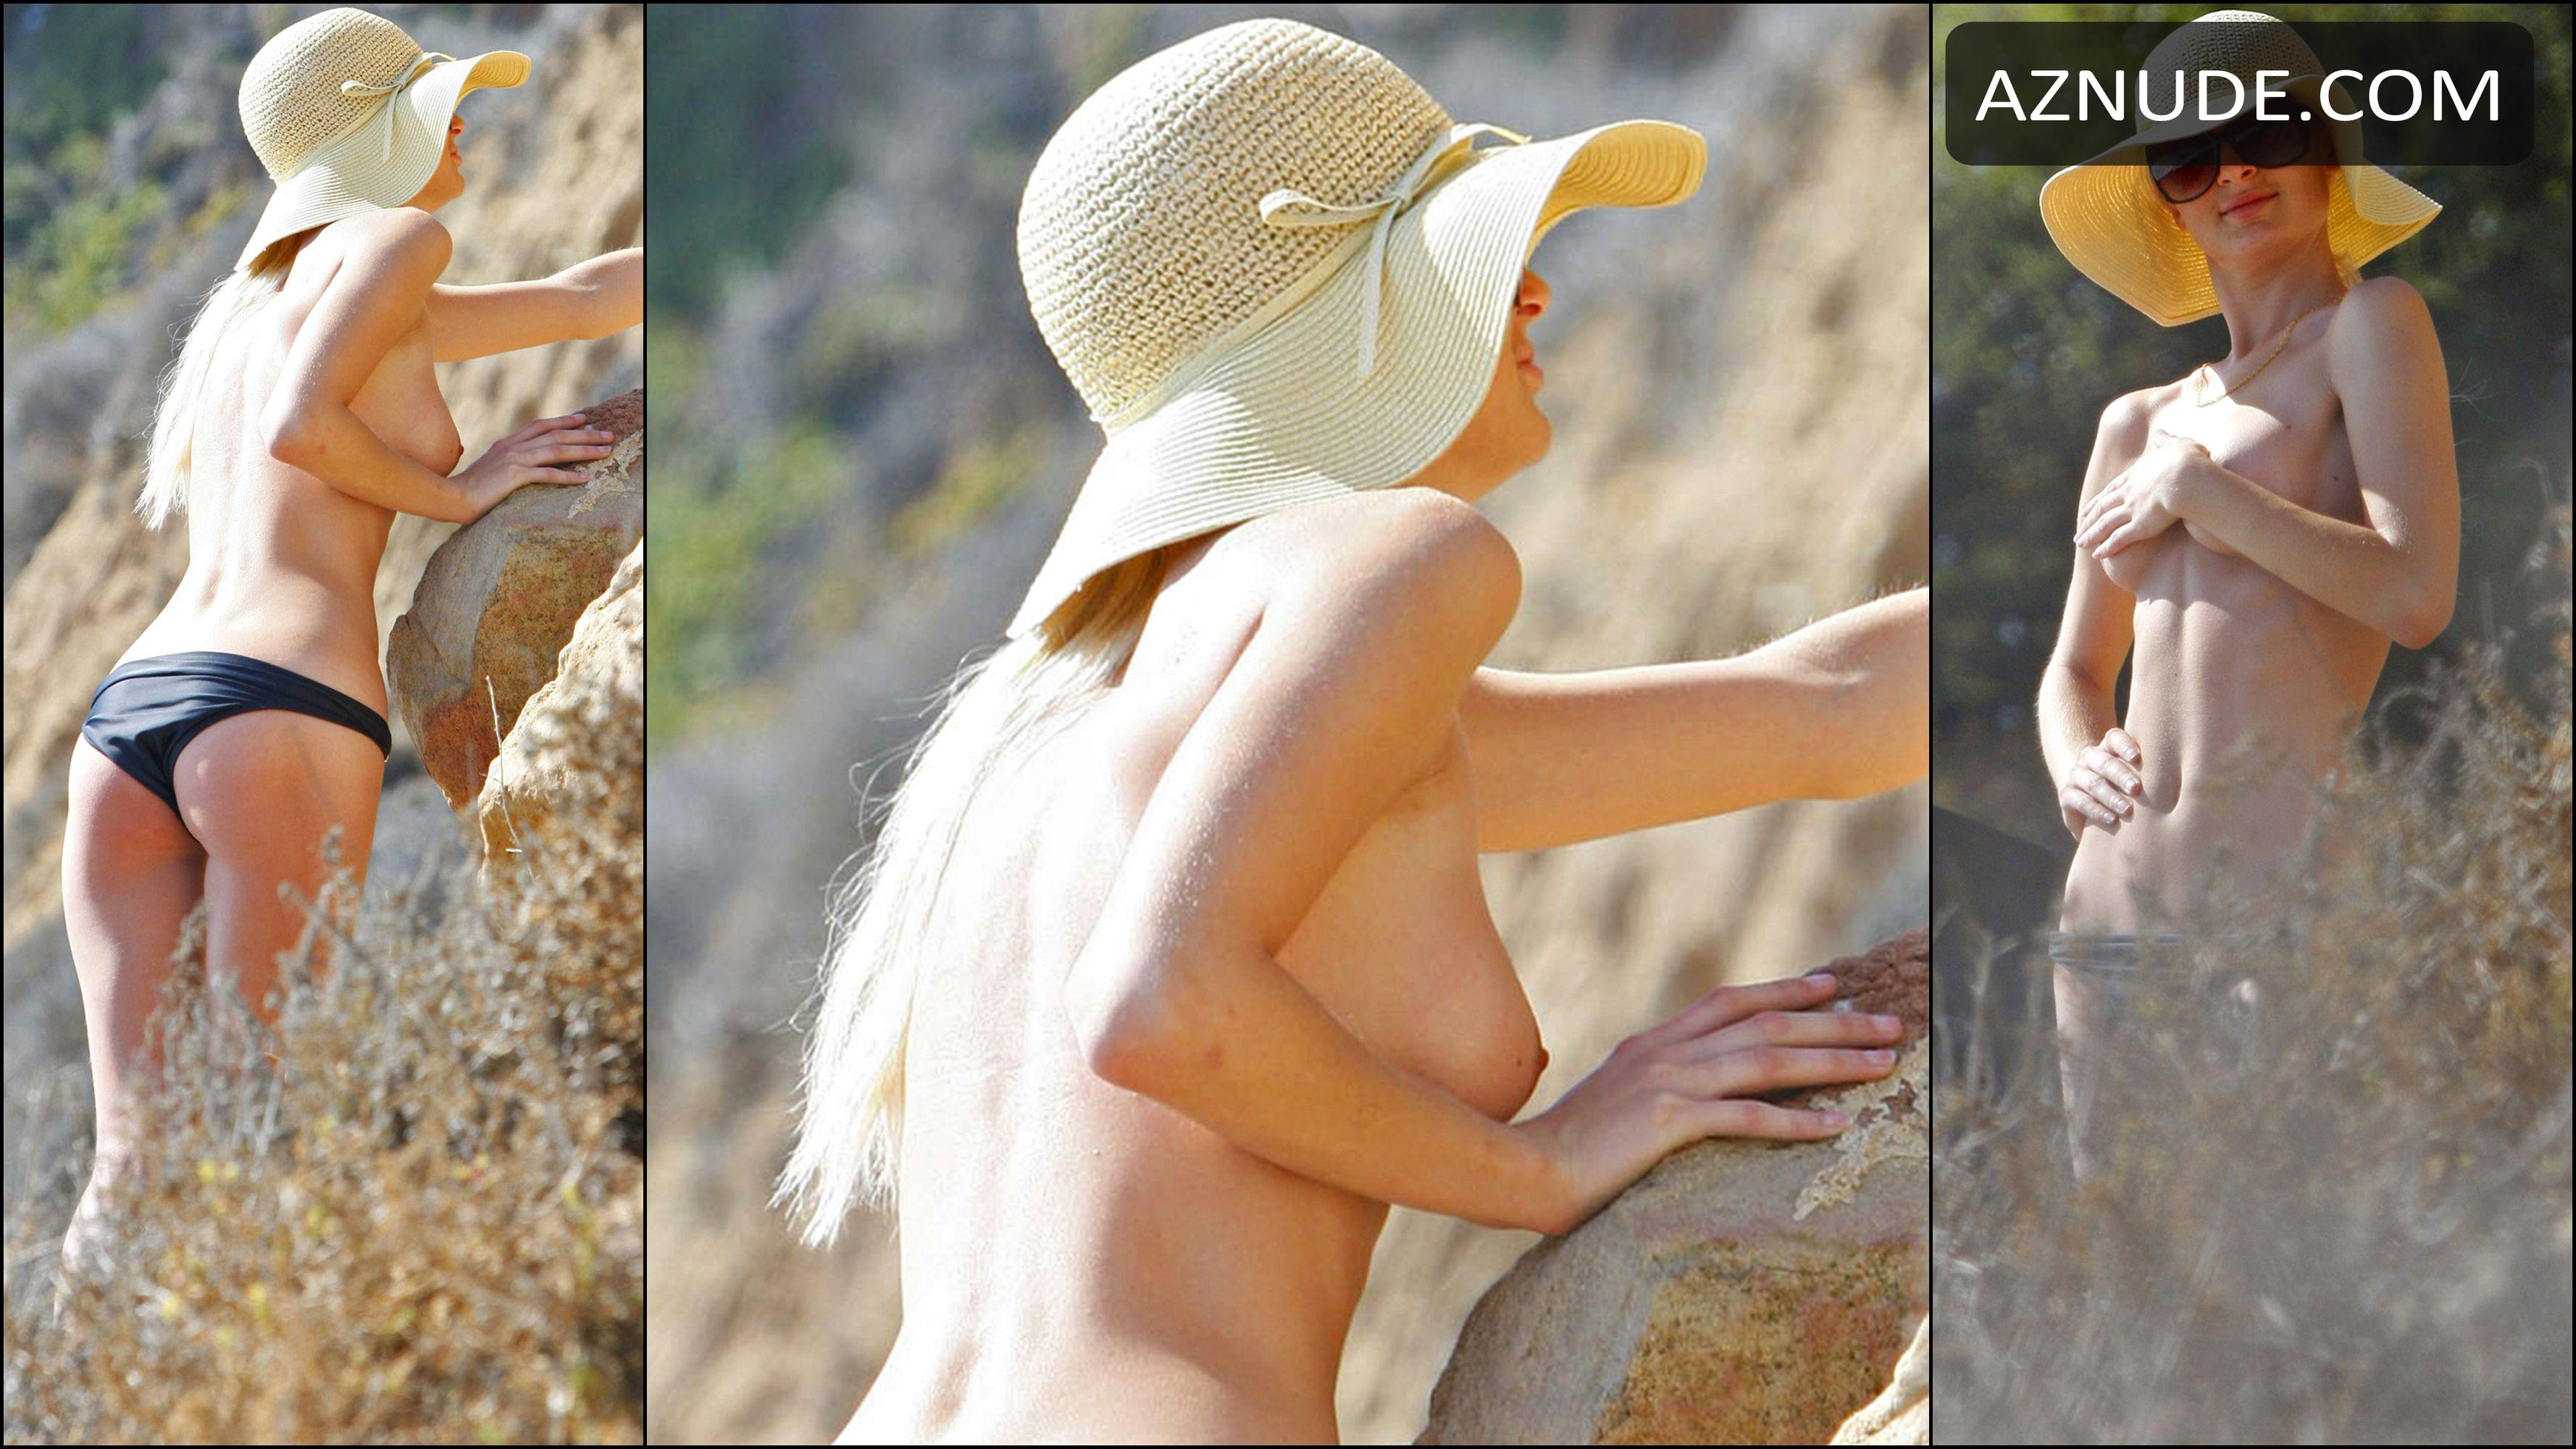 Paris Hilton Nippel